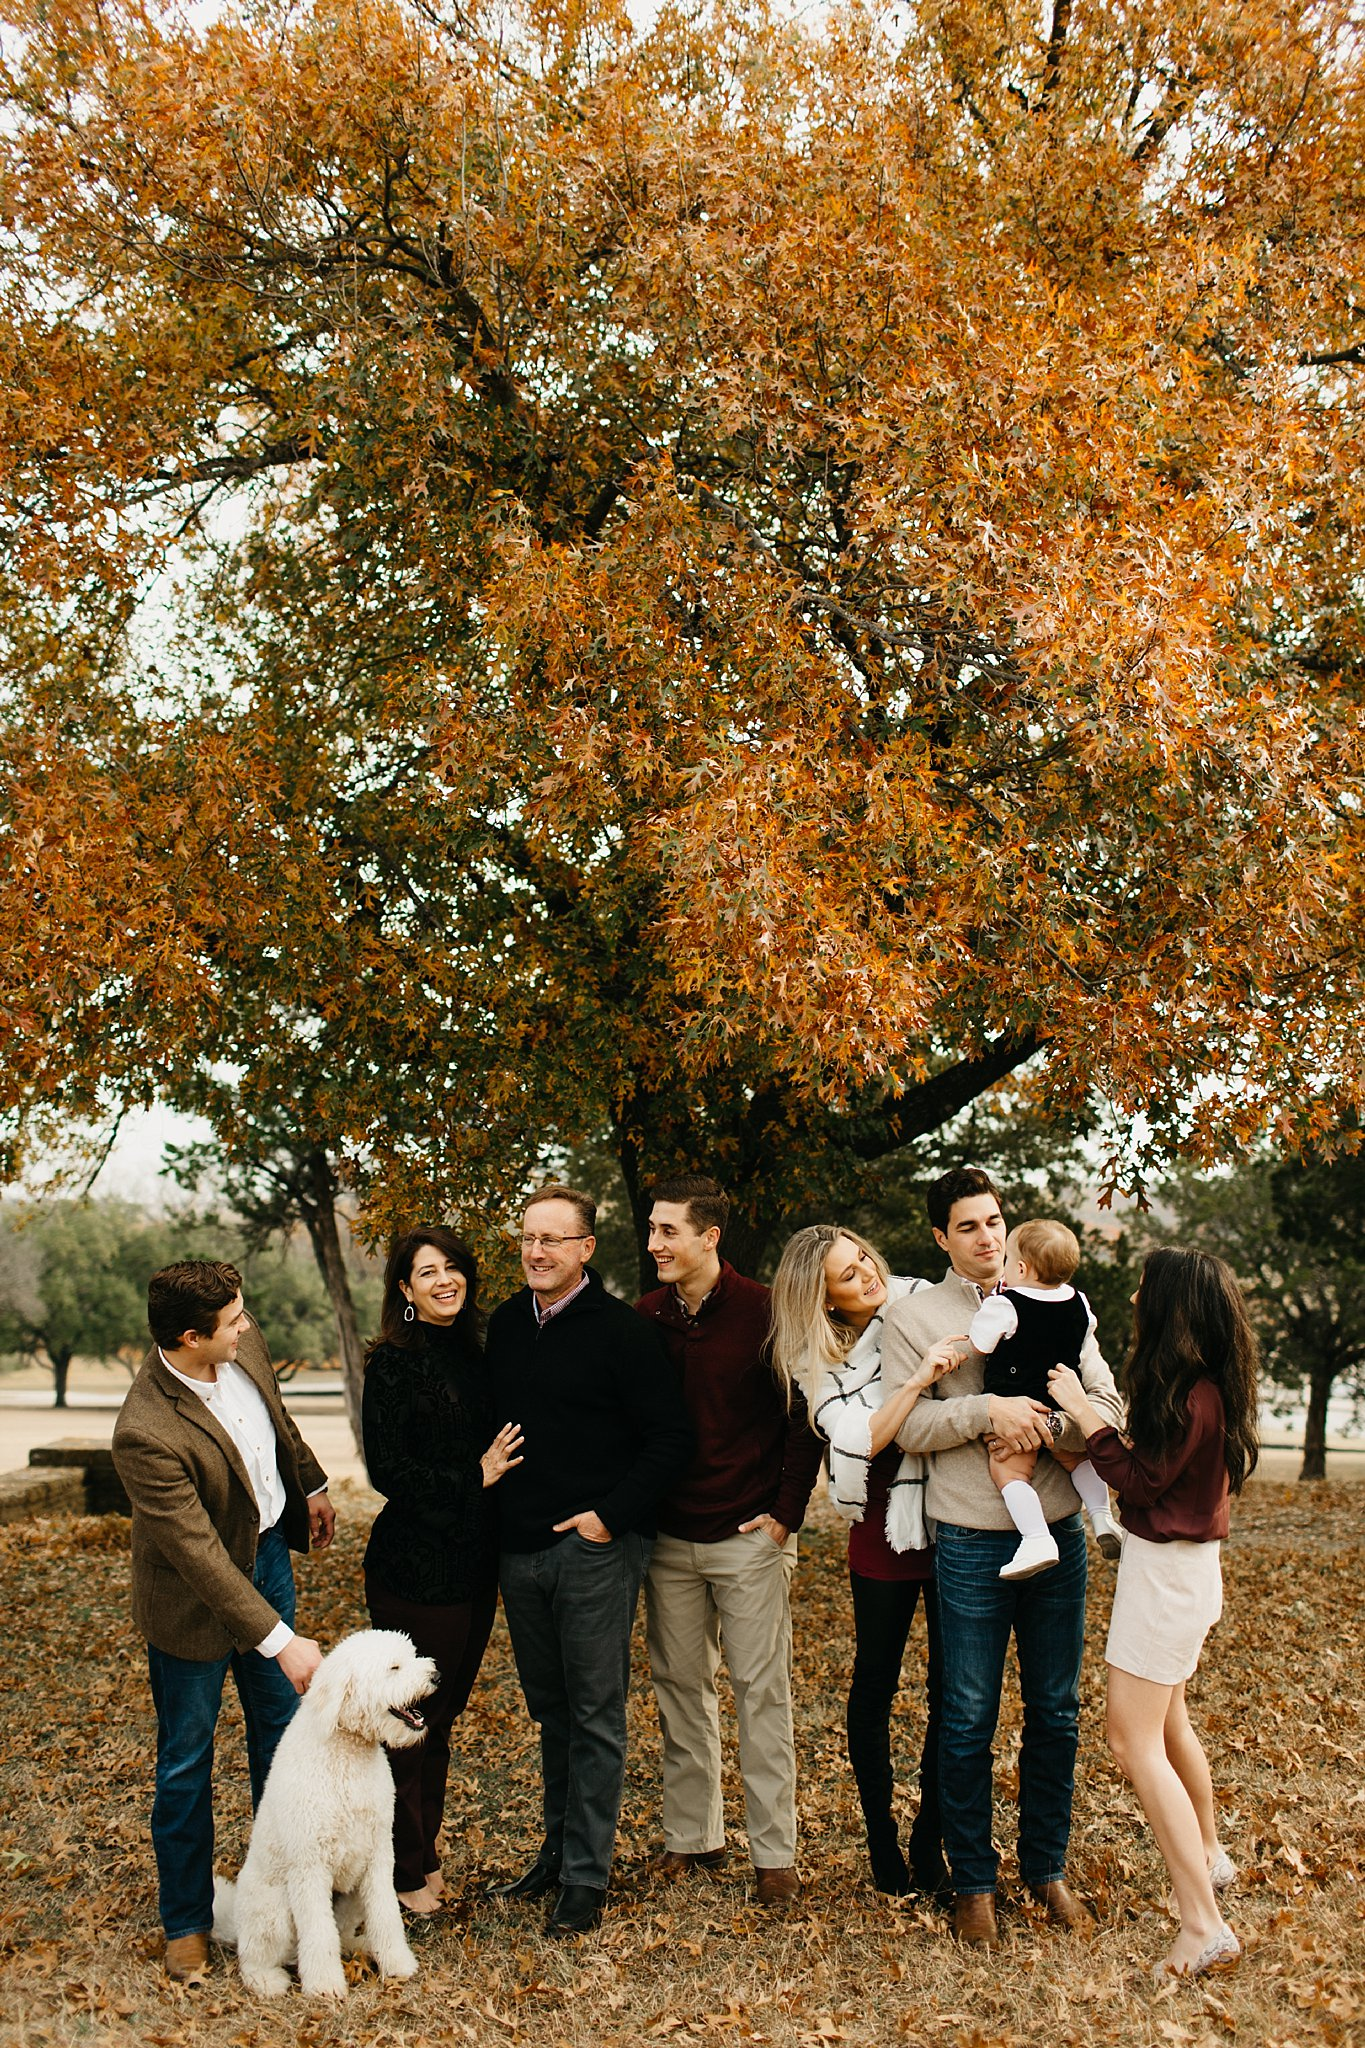 Wilderlove Co_Dallas Texas_Family Portrait Photography_0019.jpg